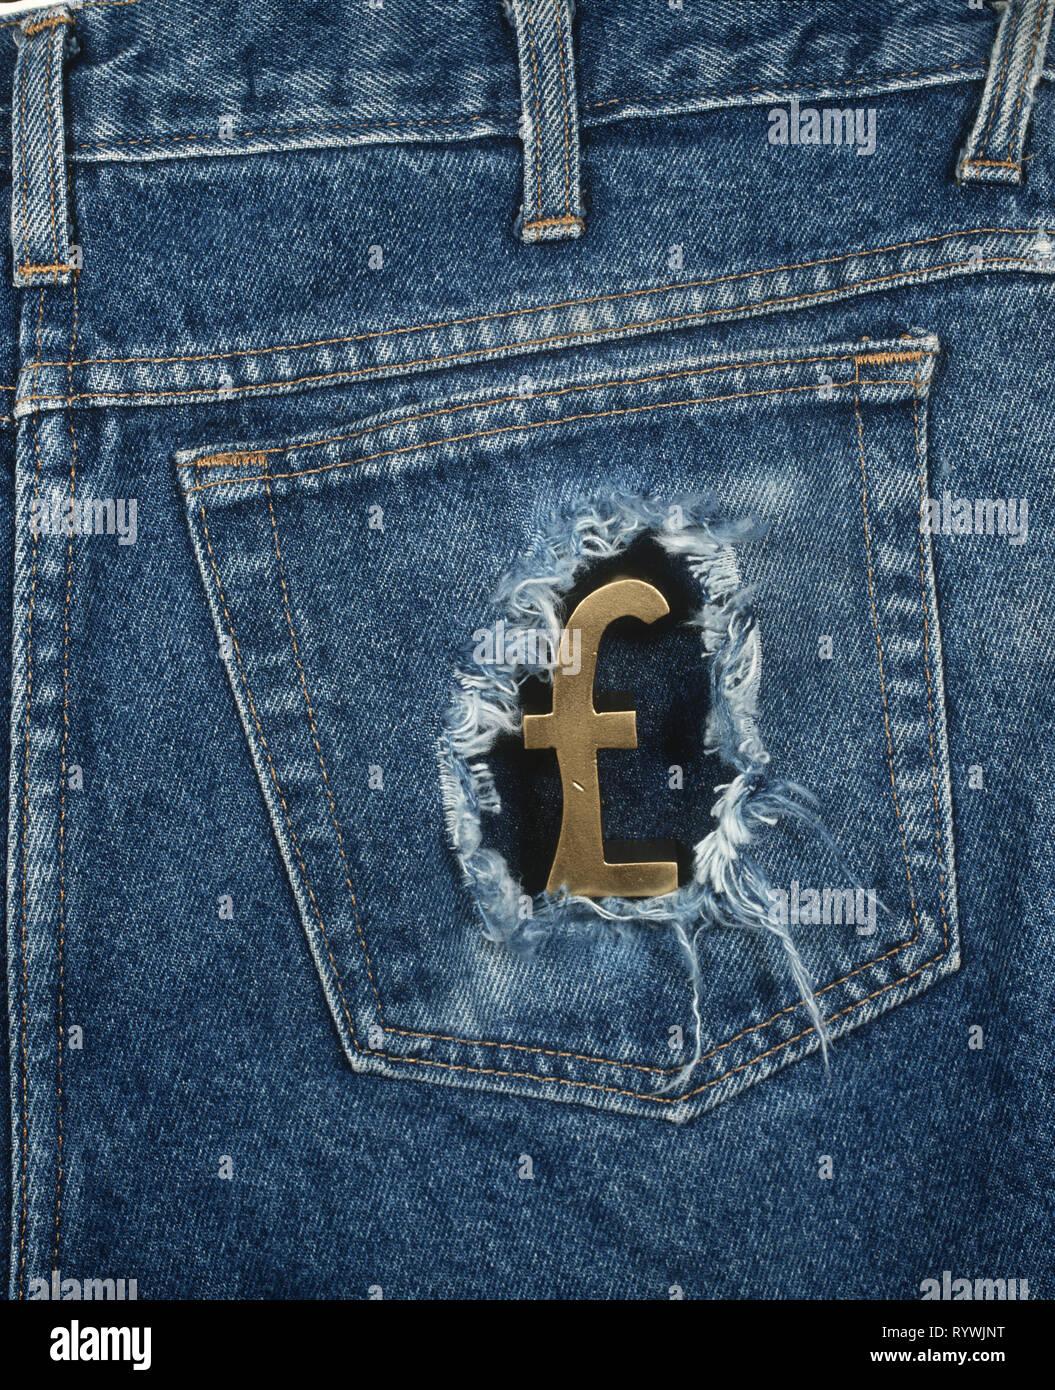 Pound sign burning a hole into jean pocket - Stock Image